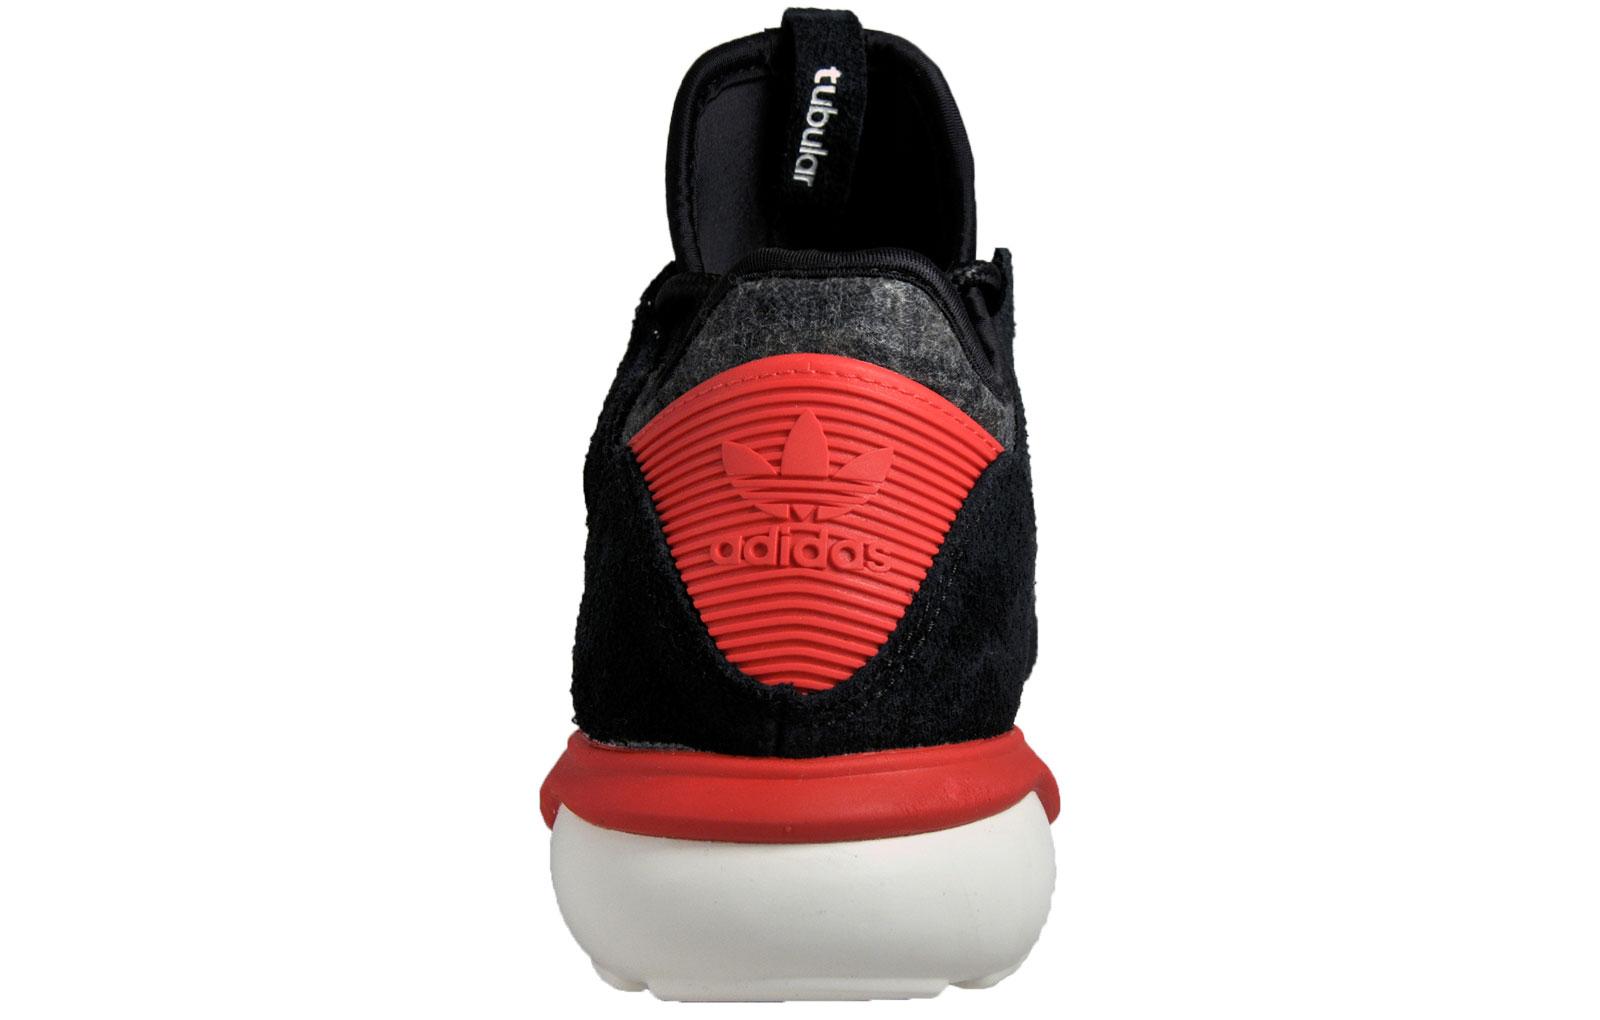 6bd11cd6a6178c Adidas Originals Tubular Moc Runner Mens Suede Gym Running Casual Trainers  Black